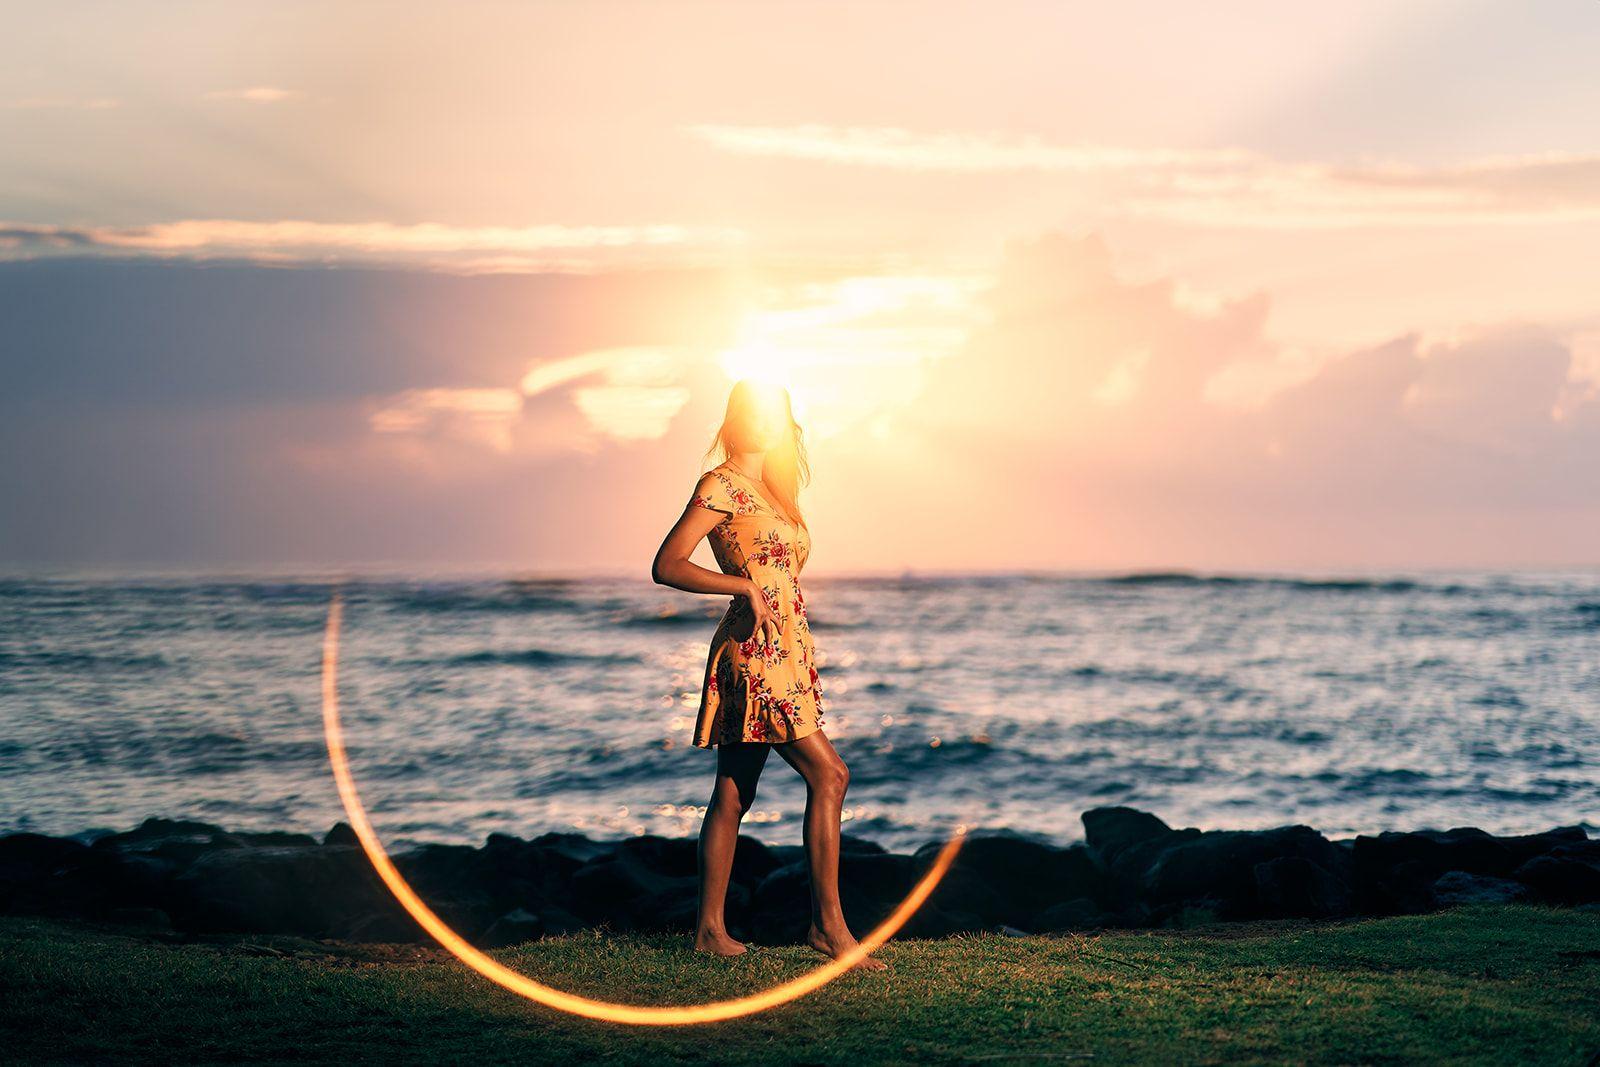 kauai-lifestyle-portraits-noka-market-by-afewgoodclicks 5_websize